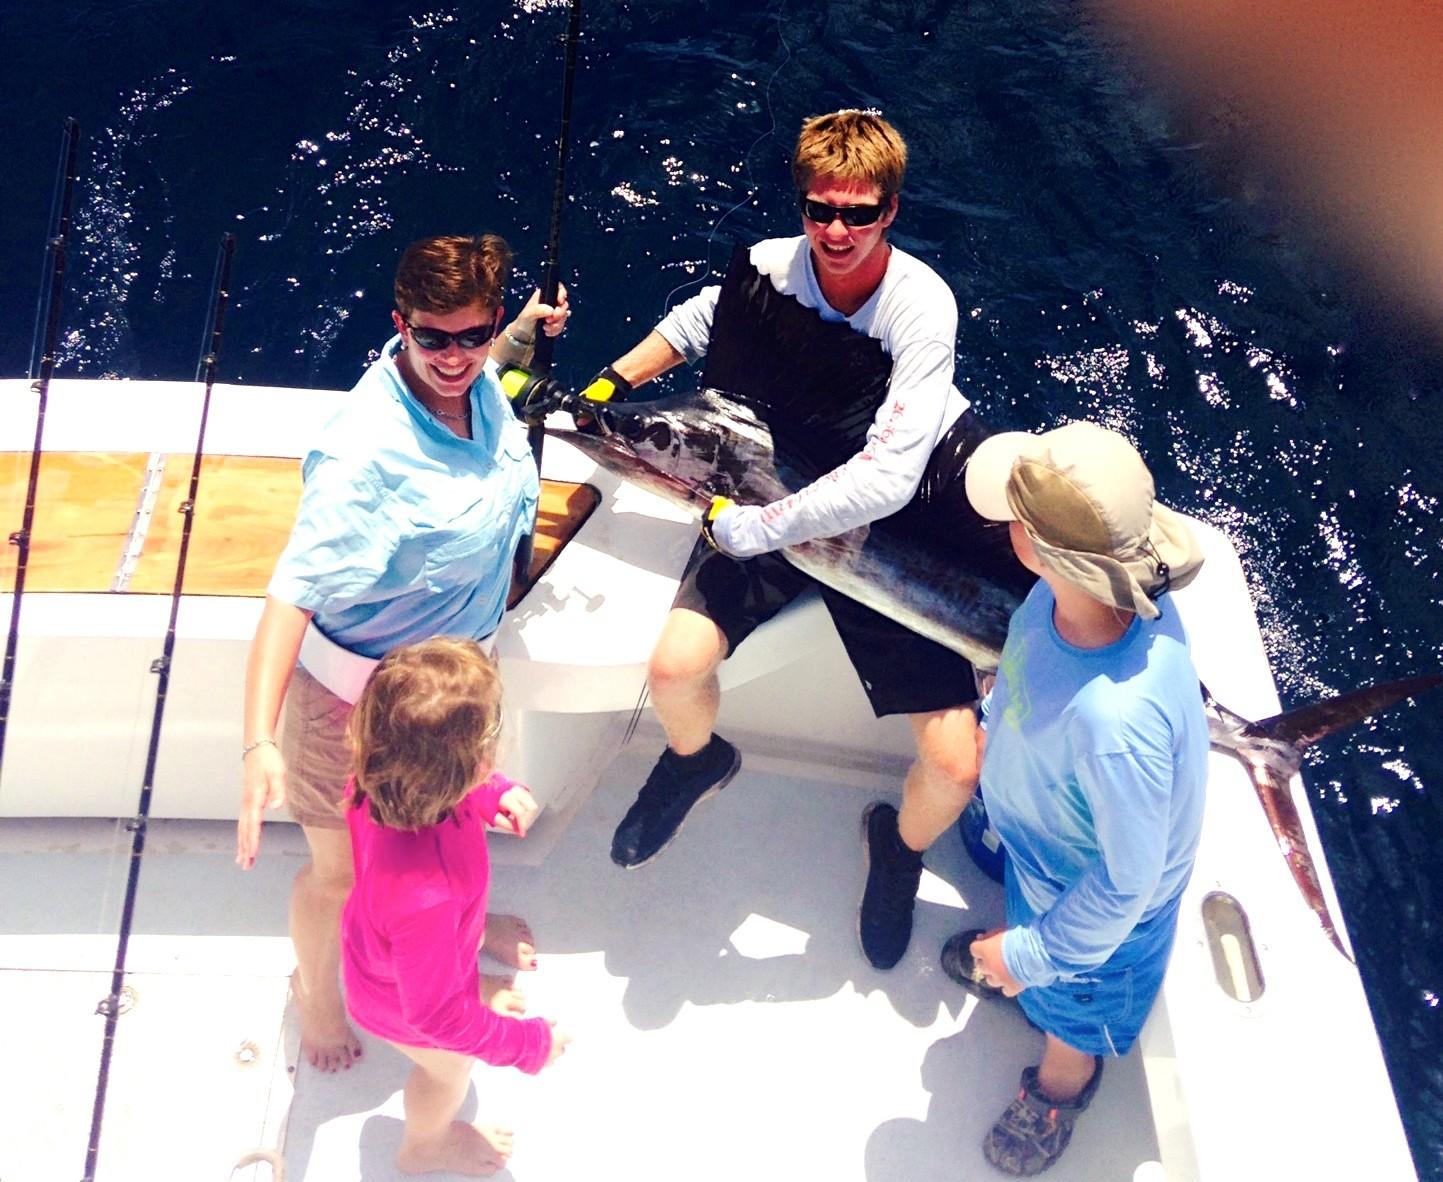 Wet N Wild Sport Fishing: 1/2 day charter